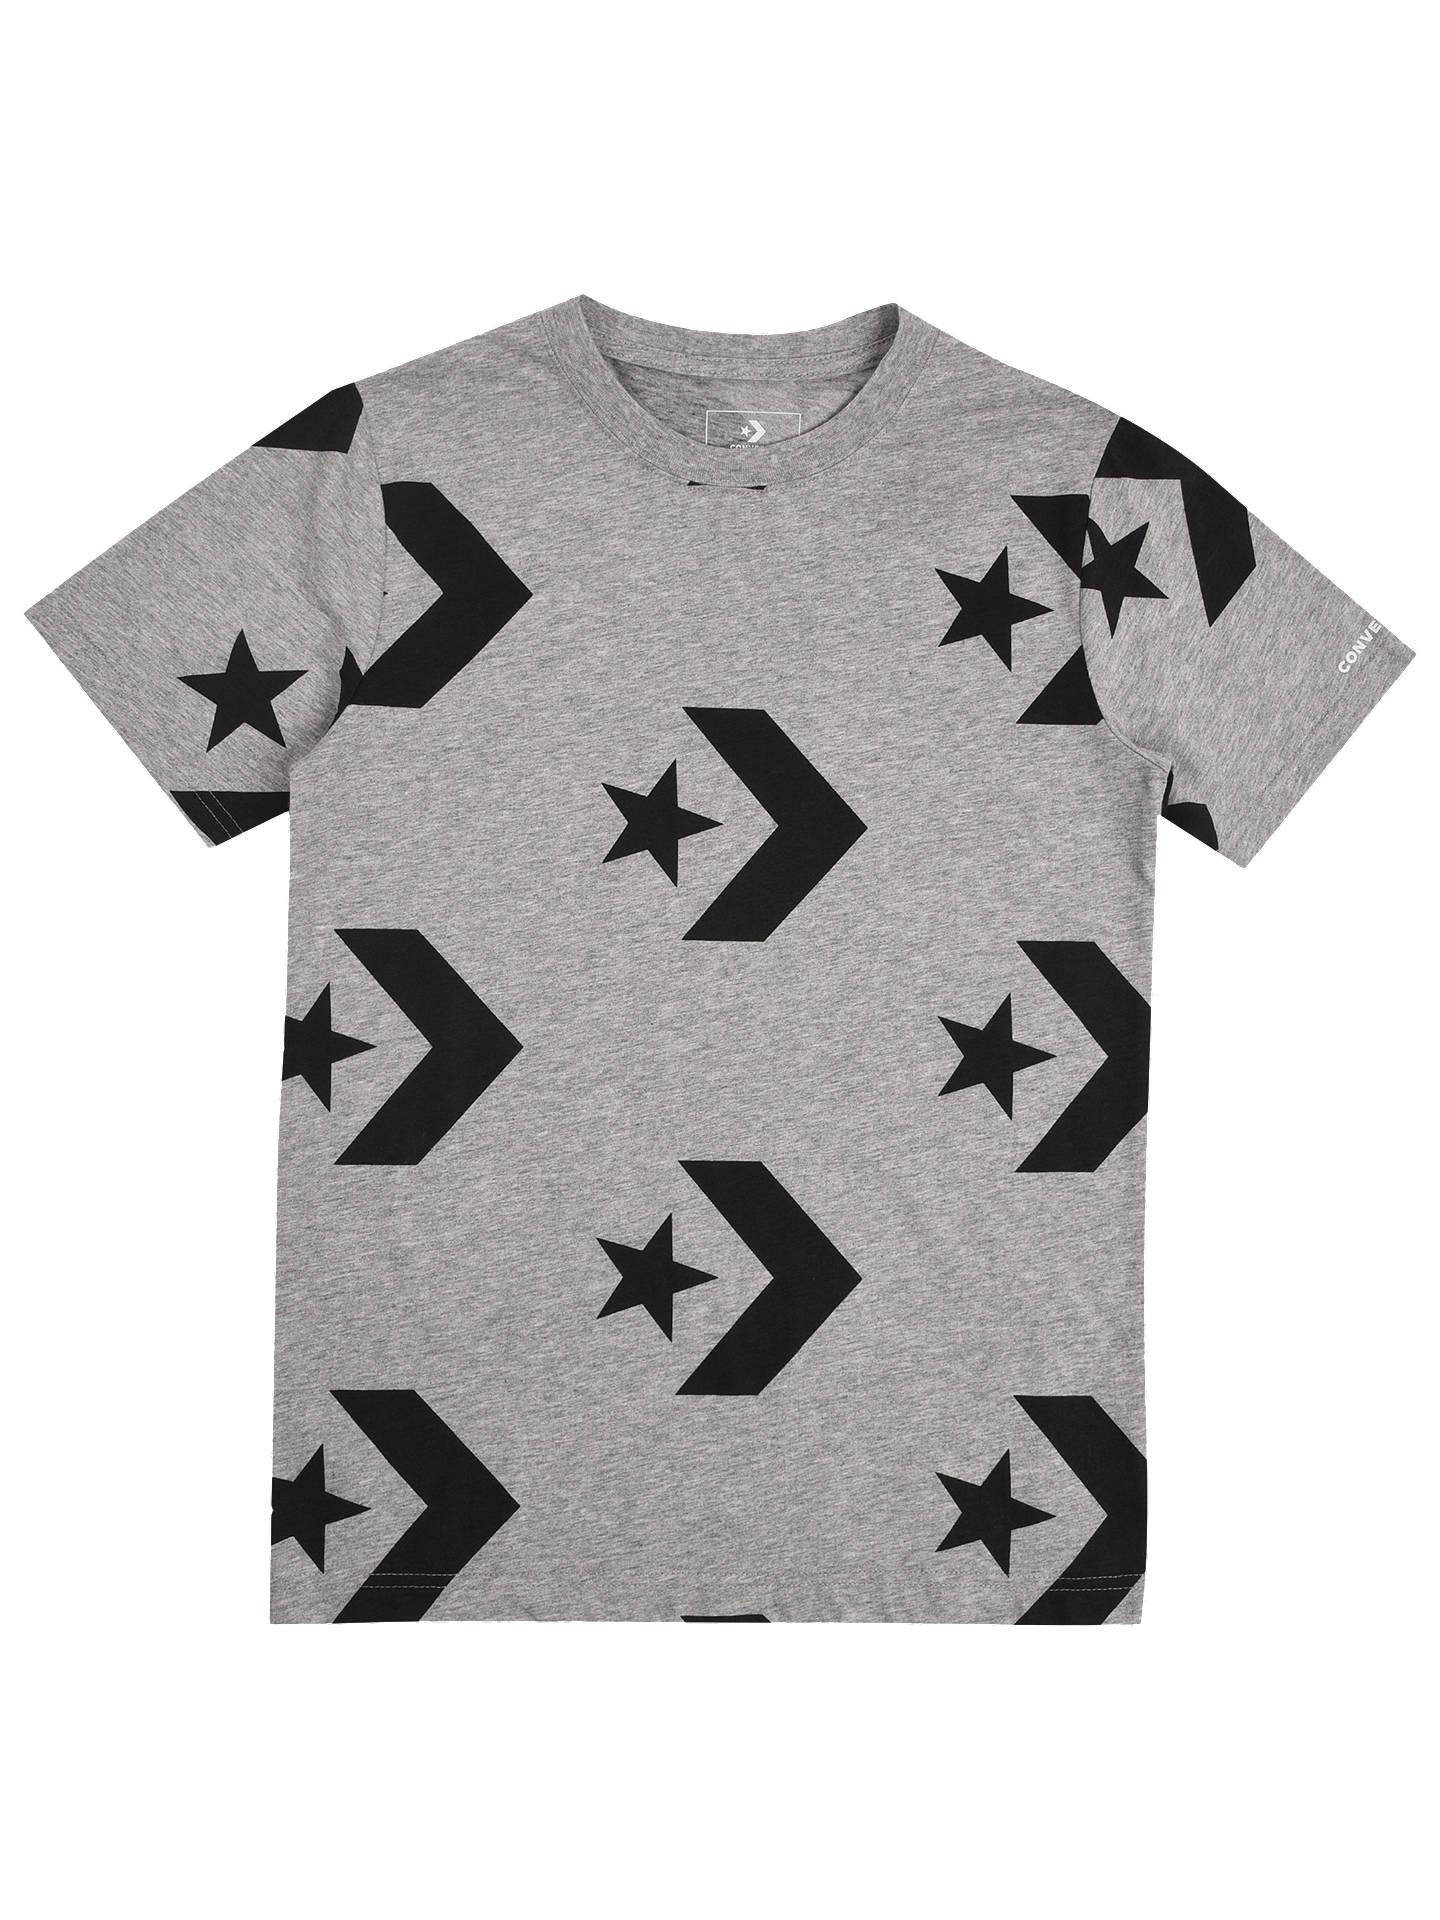 a7e85d1931f0 Buy Converse Boys  Star Chevron Print T-Shirt